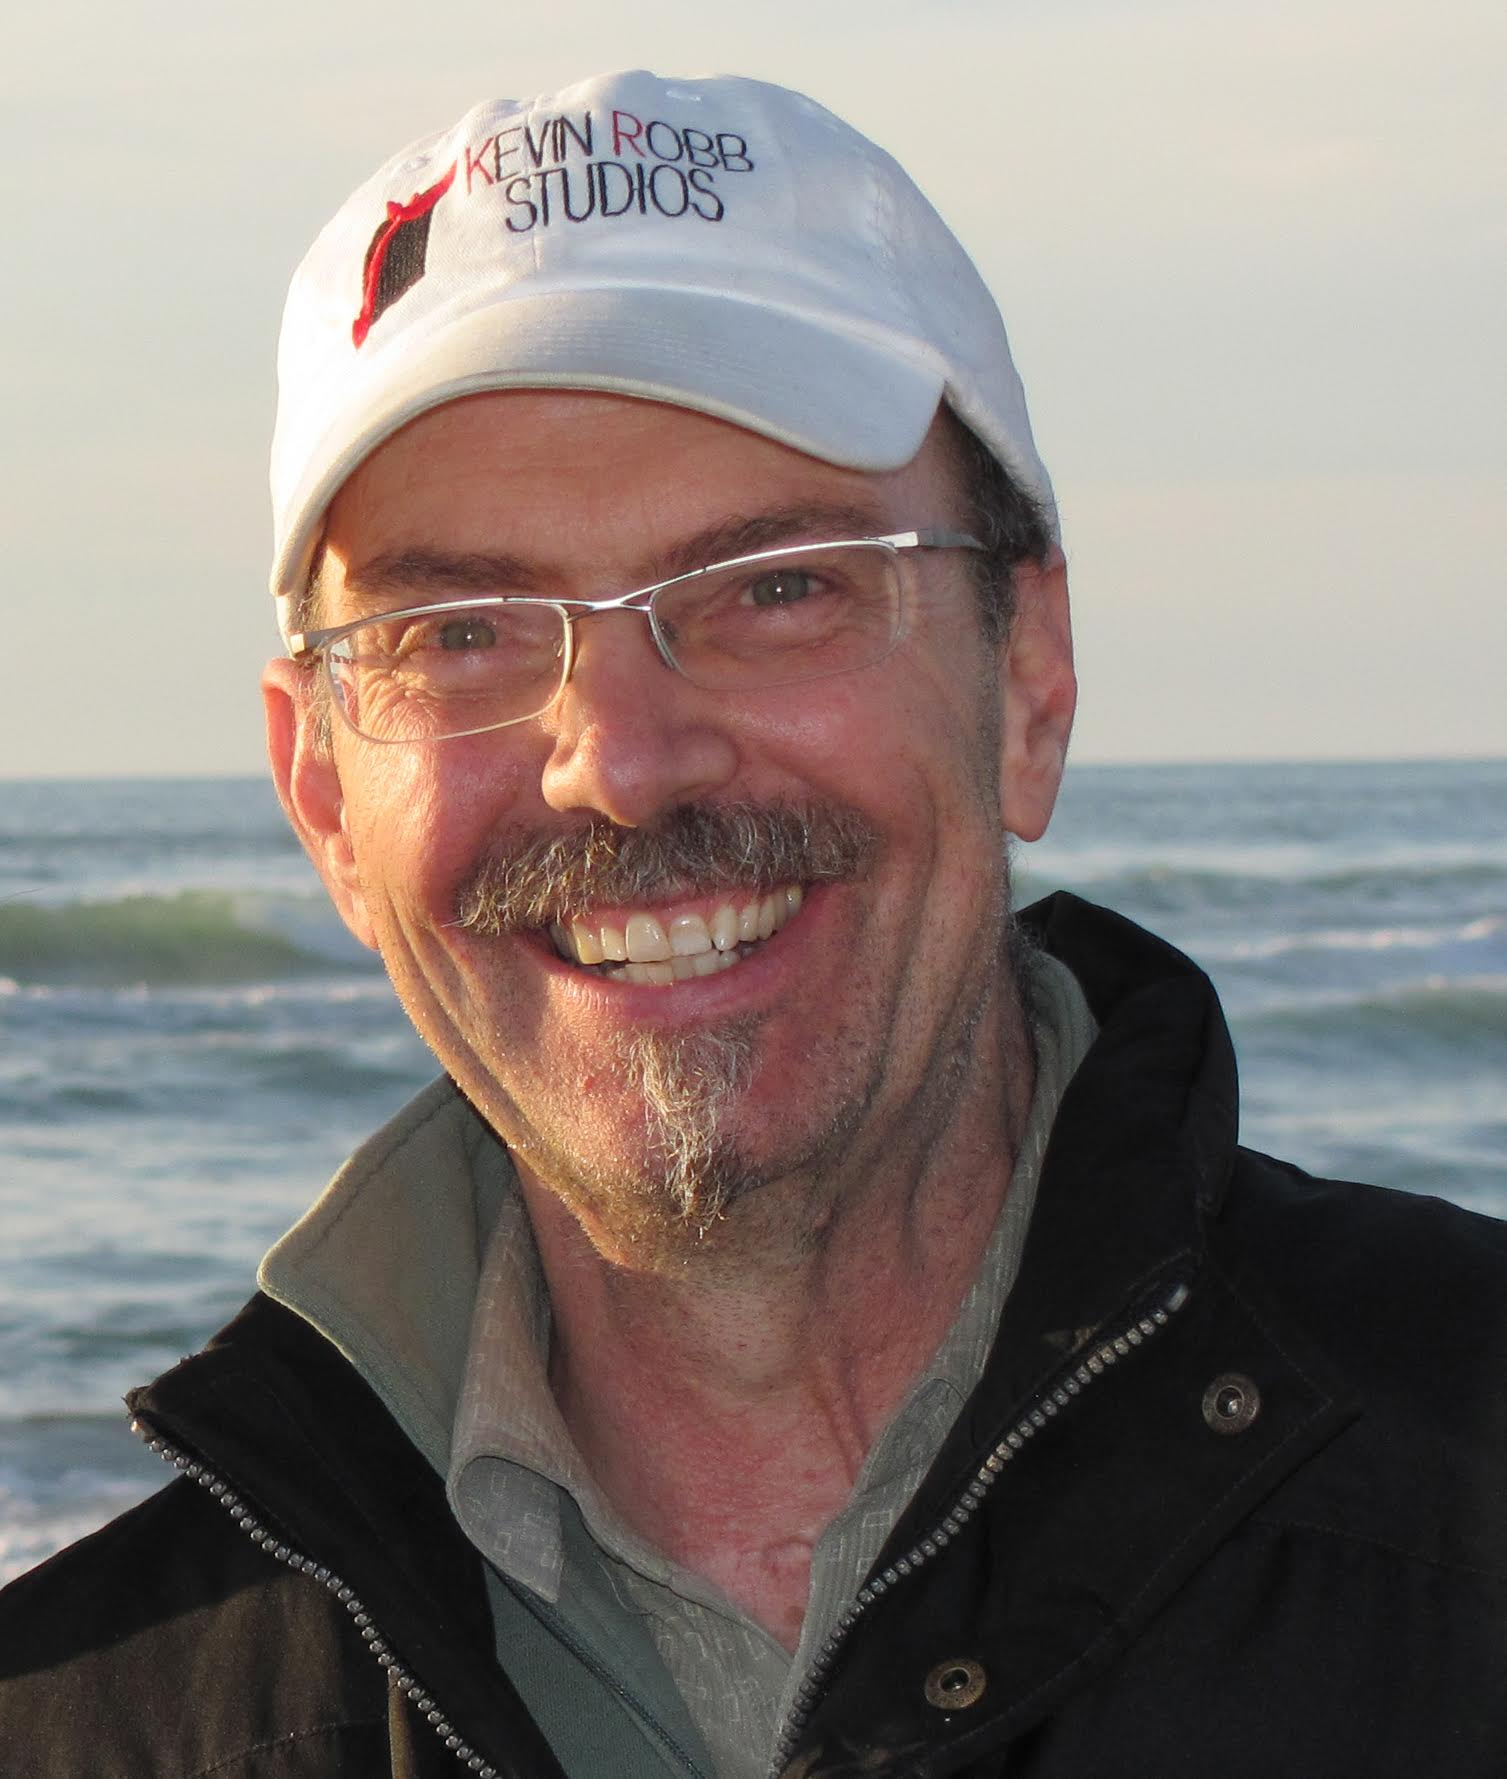 Kevin Robb, artist